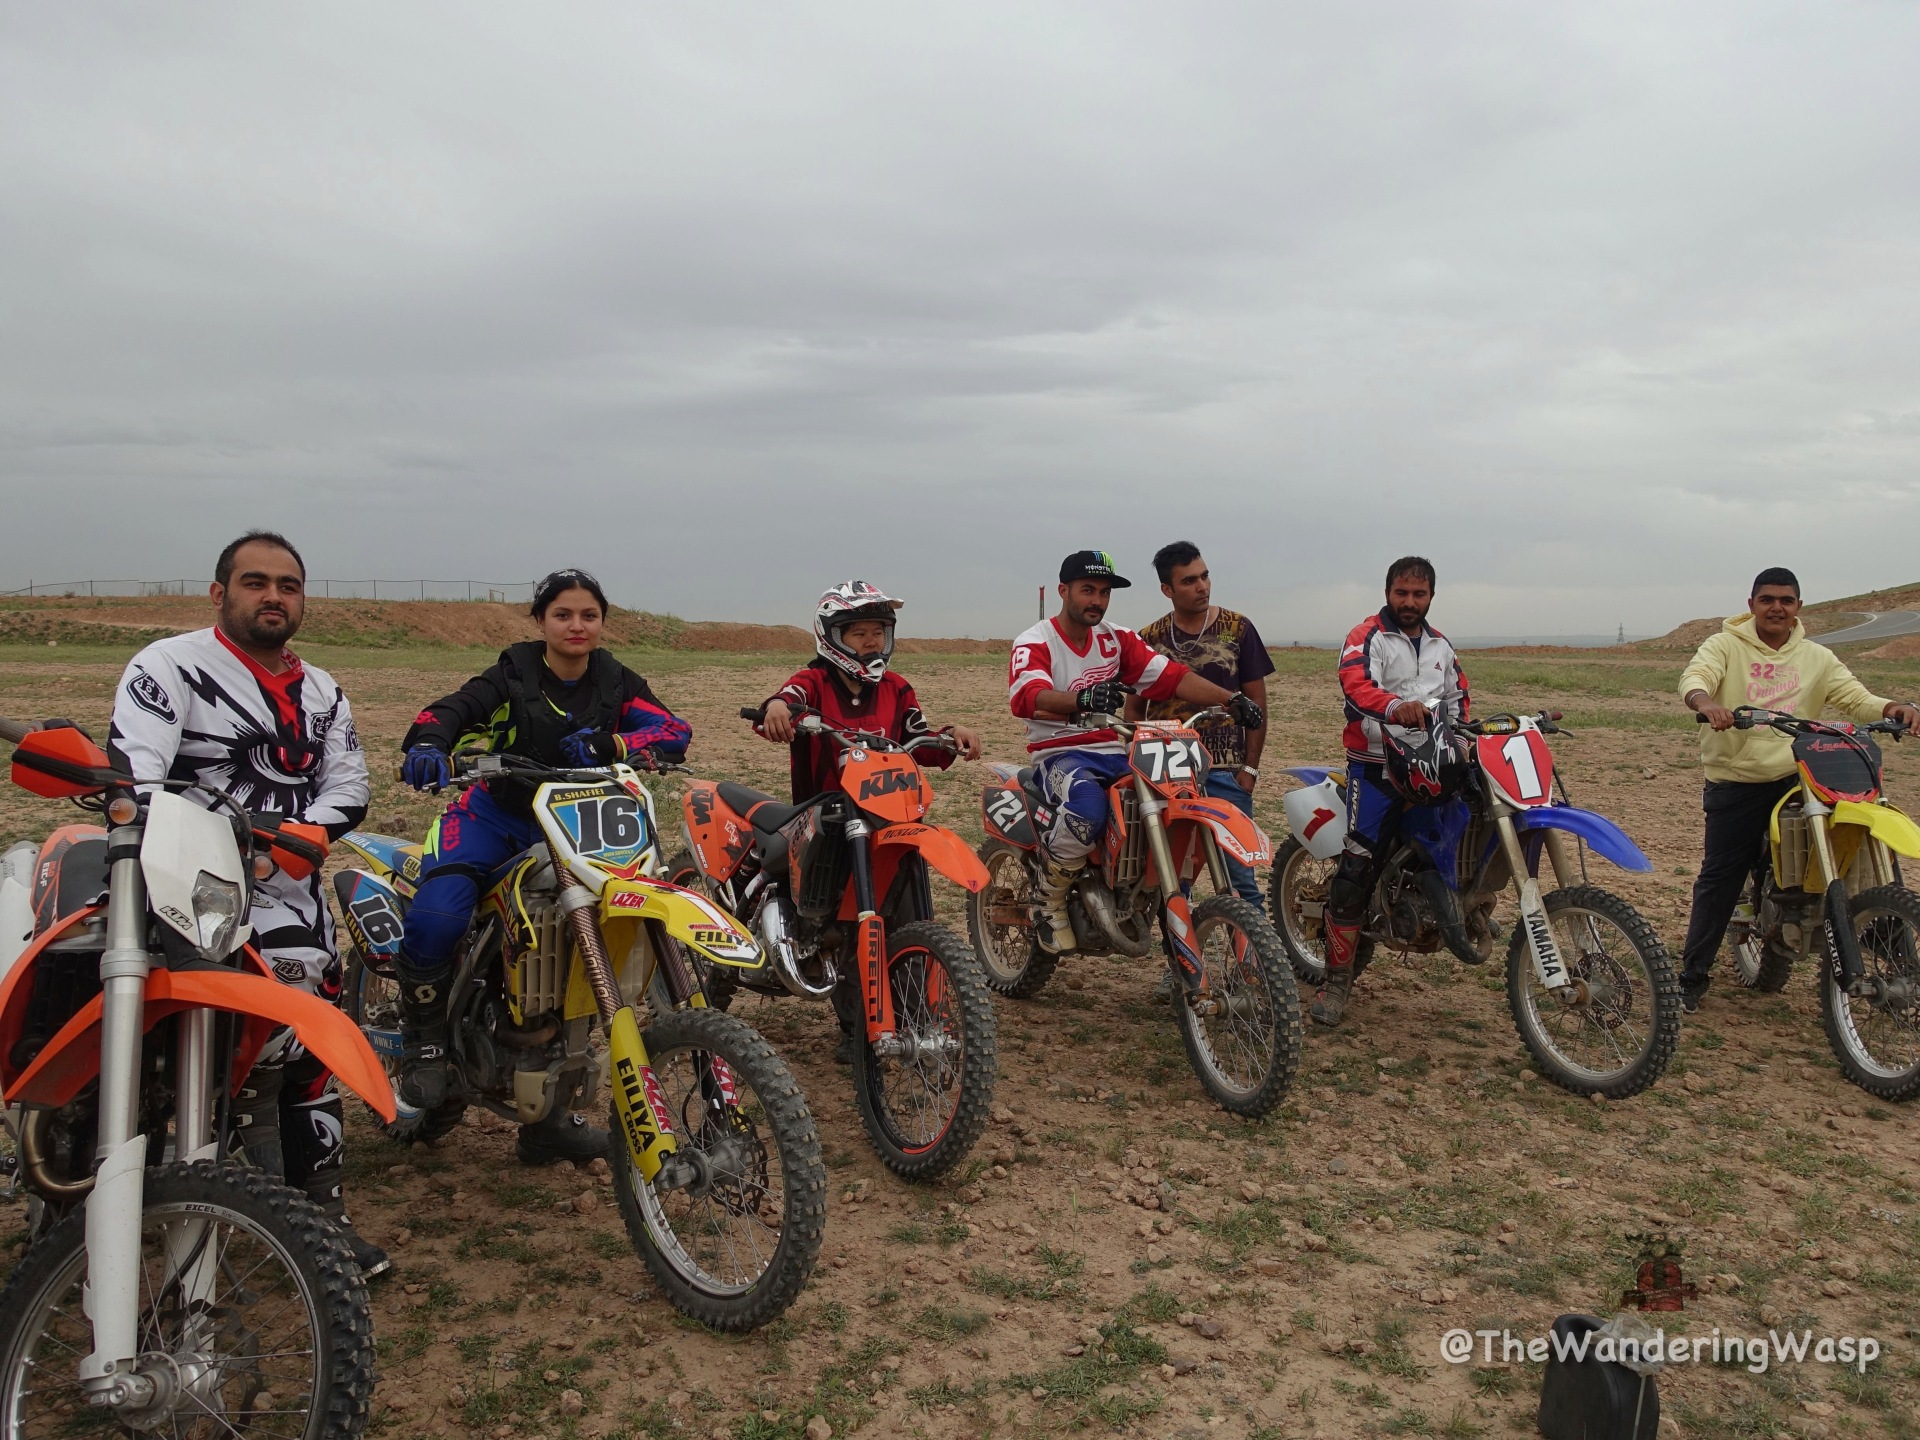 Iran, with motocross riders (1).jpg